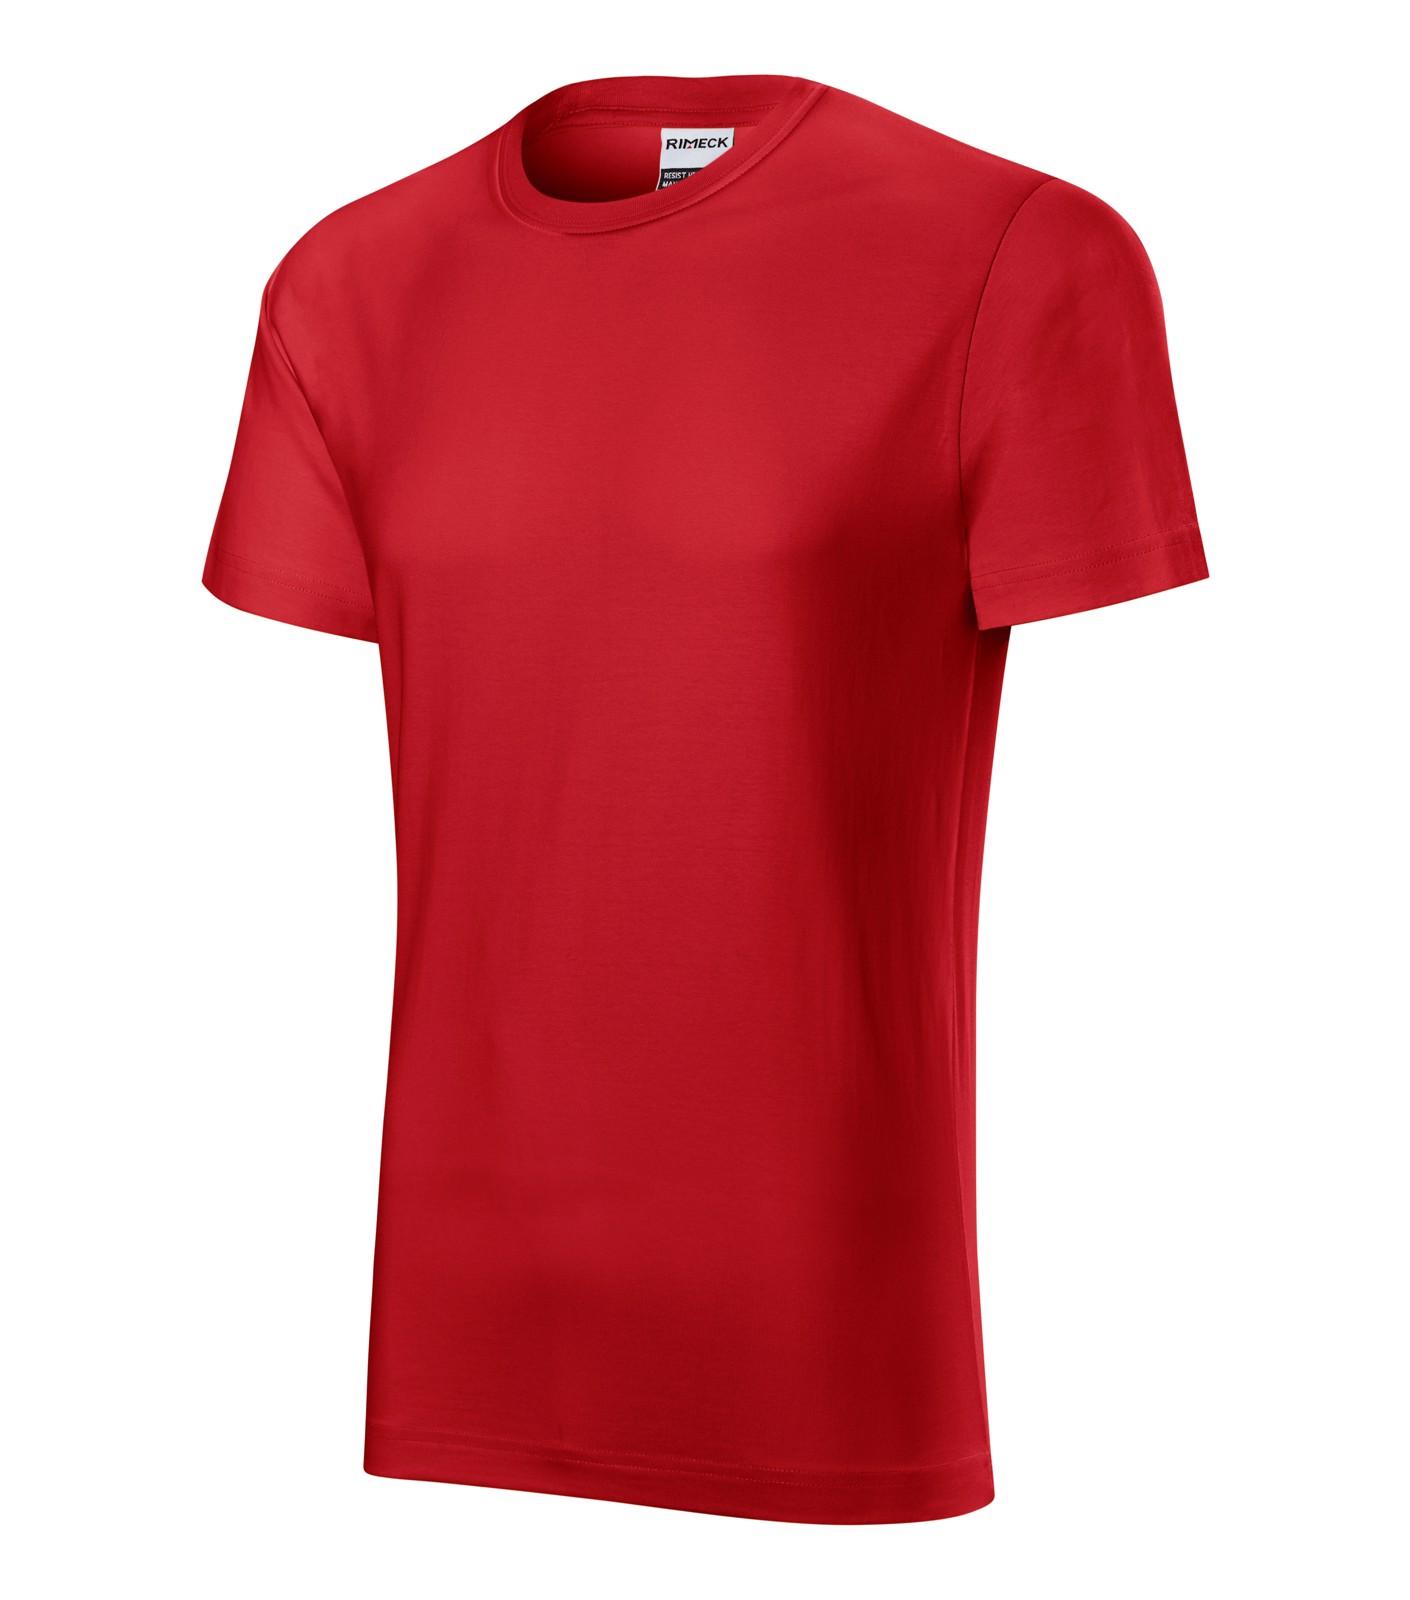 T-shirt men's Rimeck Resist heavy - Red / S